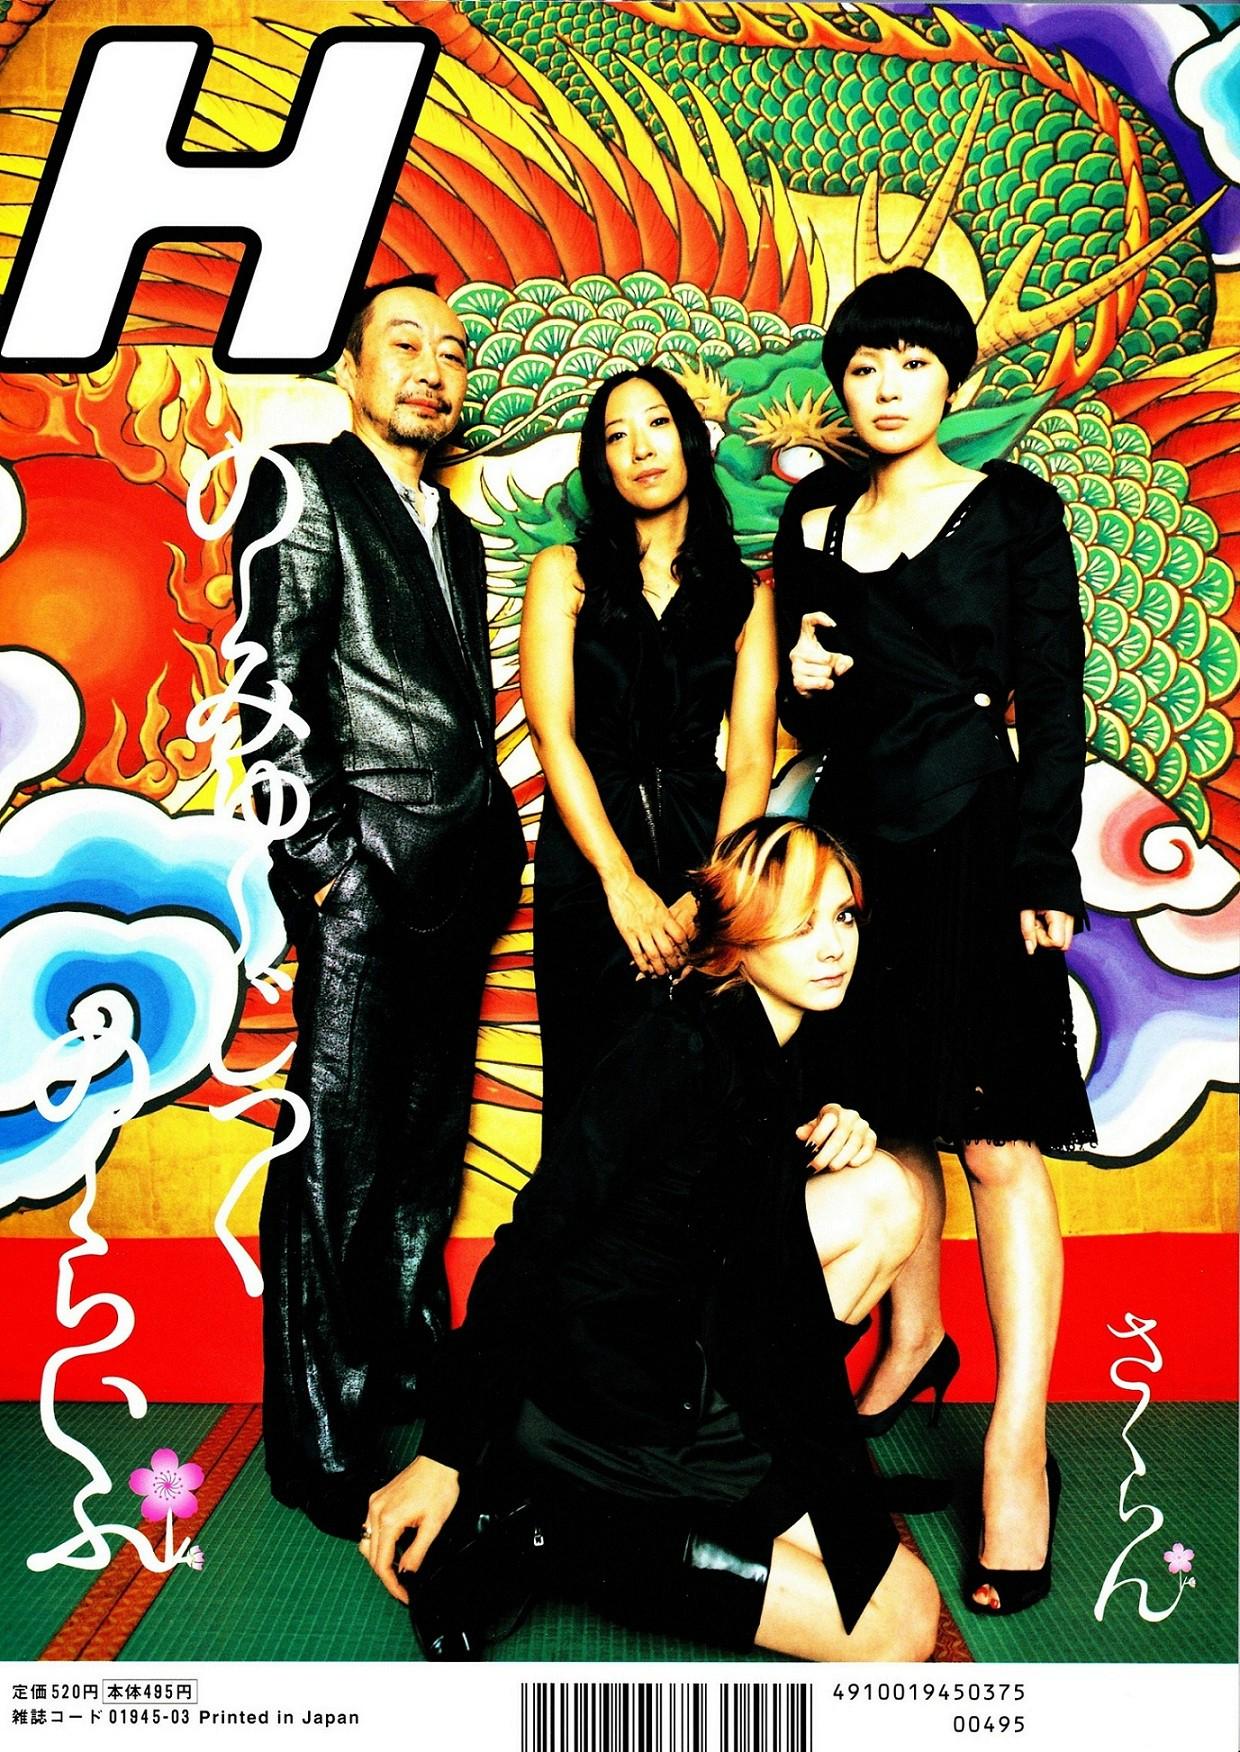 01「H」杂志 2007年03刊 封底 椎名林檎